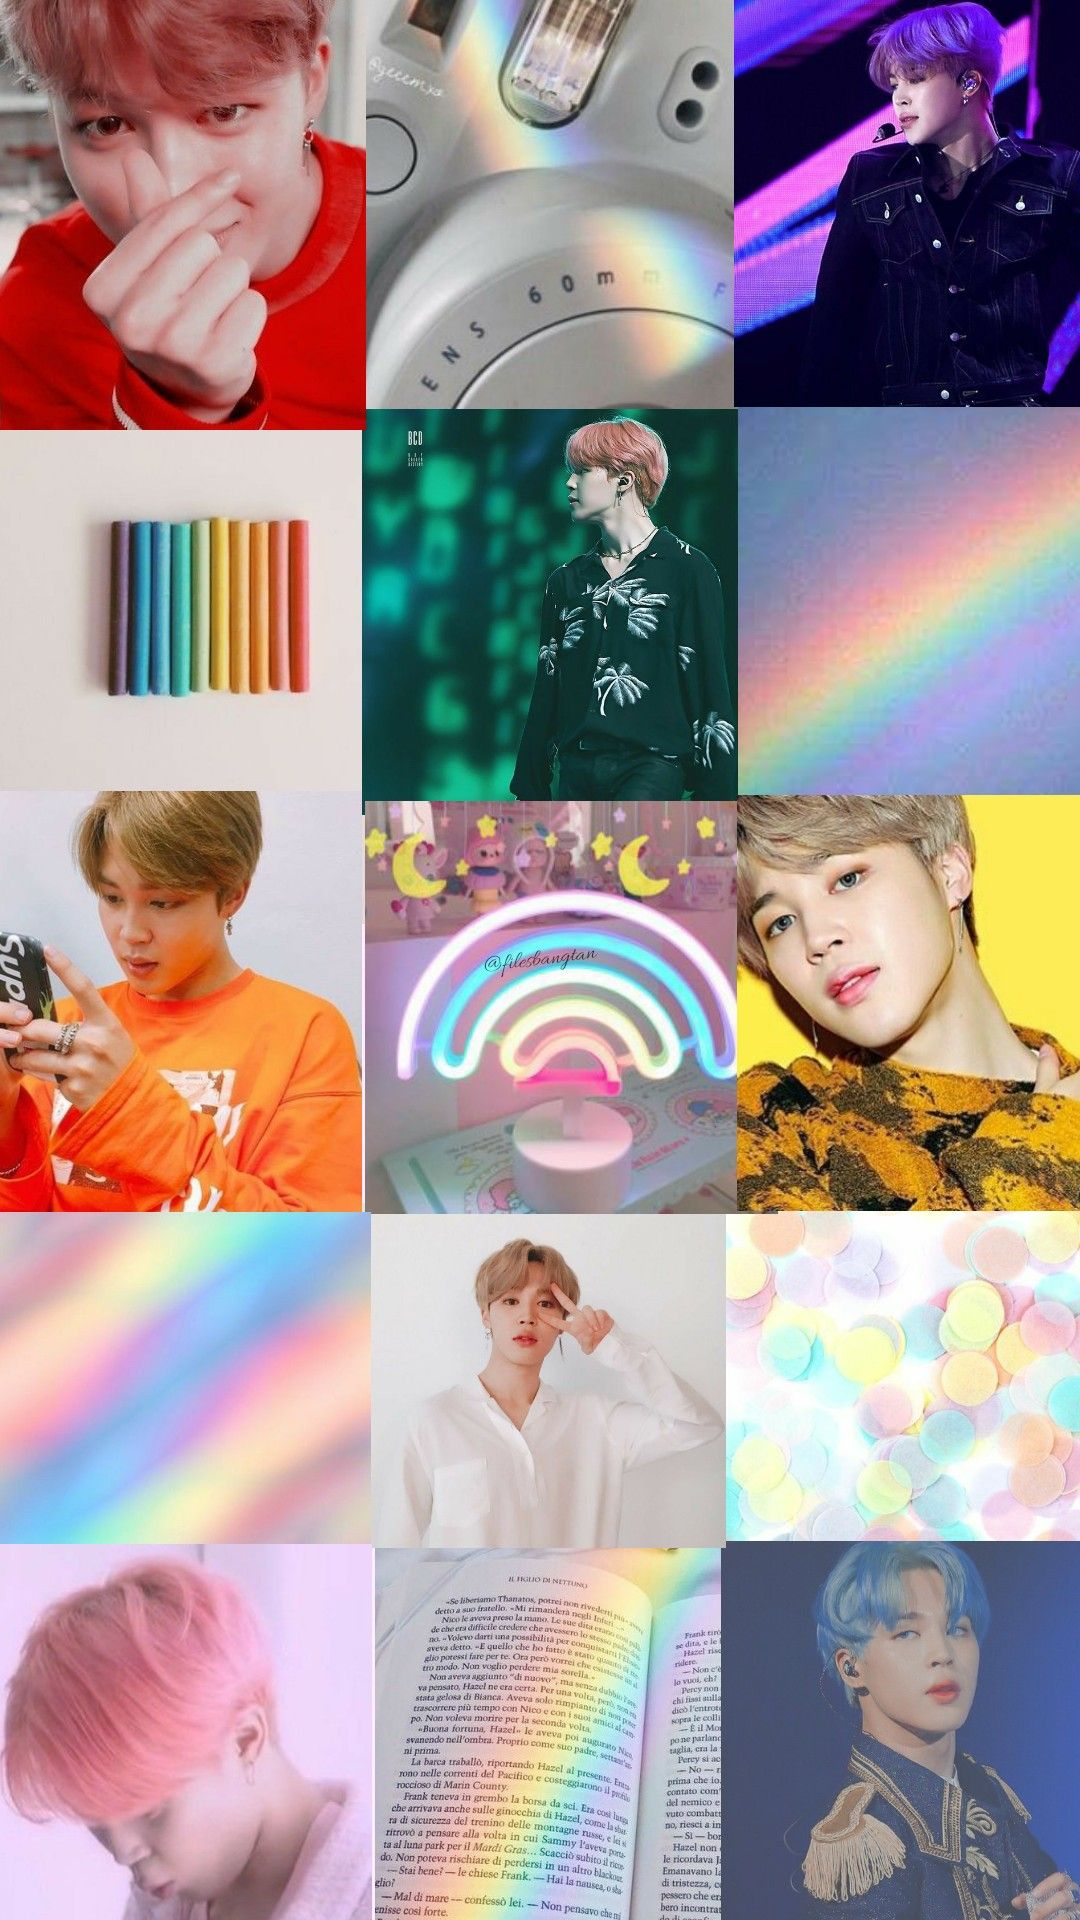 Wallpaper Bts Twt Park Jimin Aesthetic Rainbow Park Jimin Bts Wallpaper Jimin Wallpaper Aesthetic Iphone Wallpaper